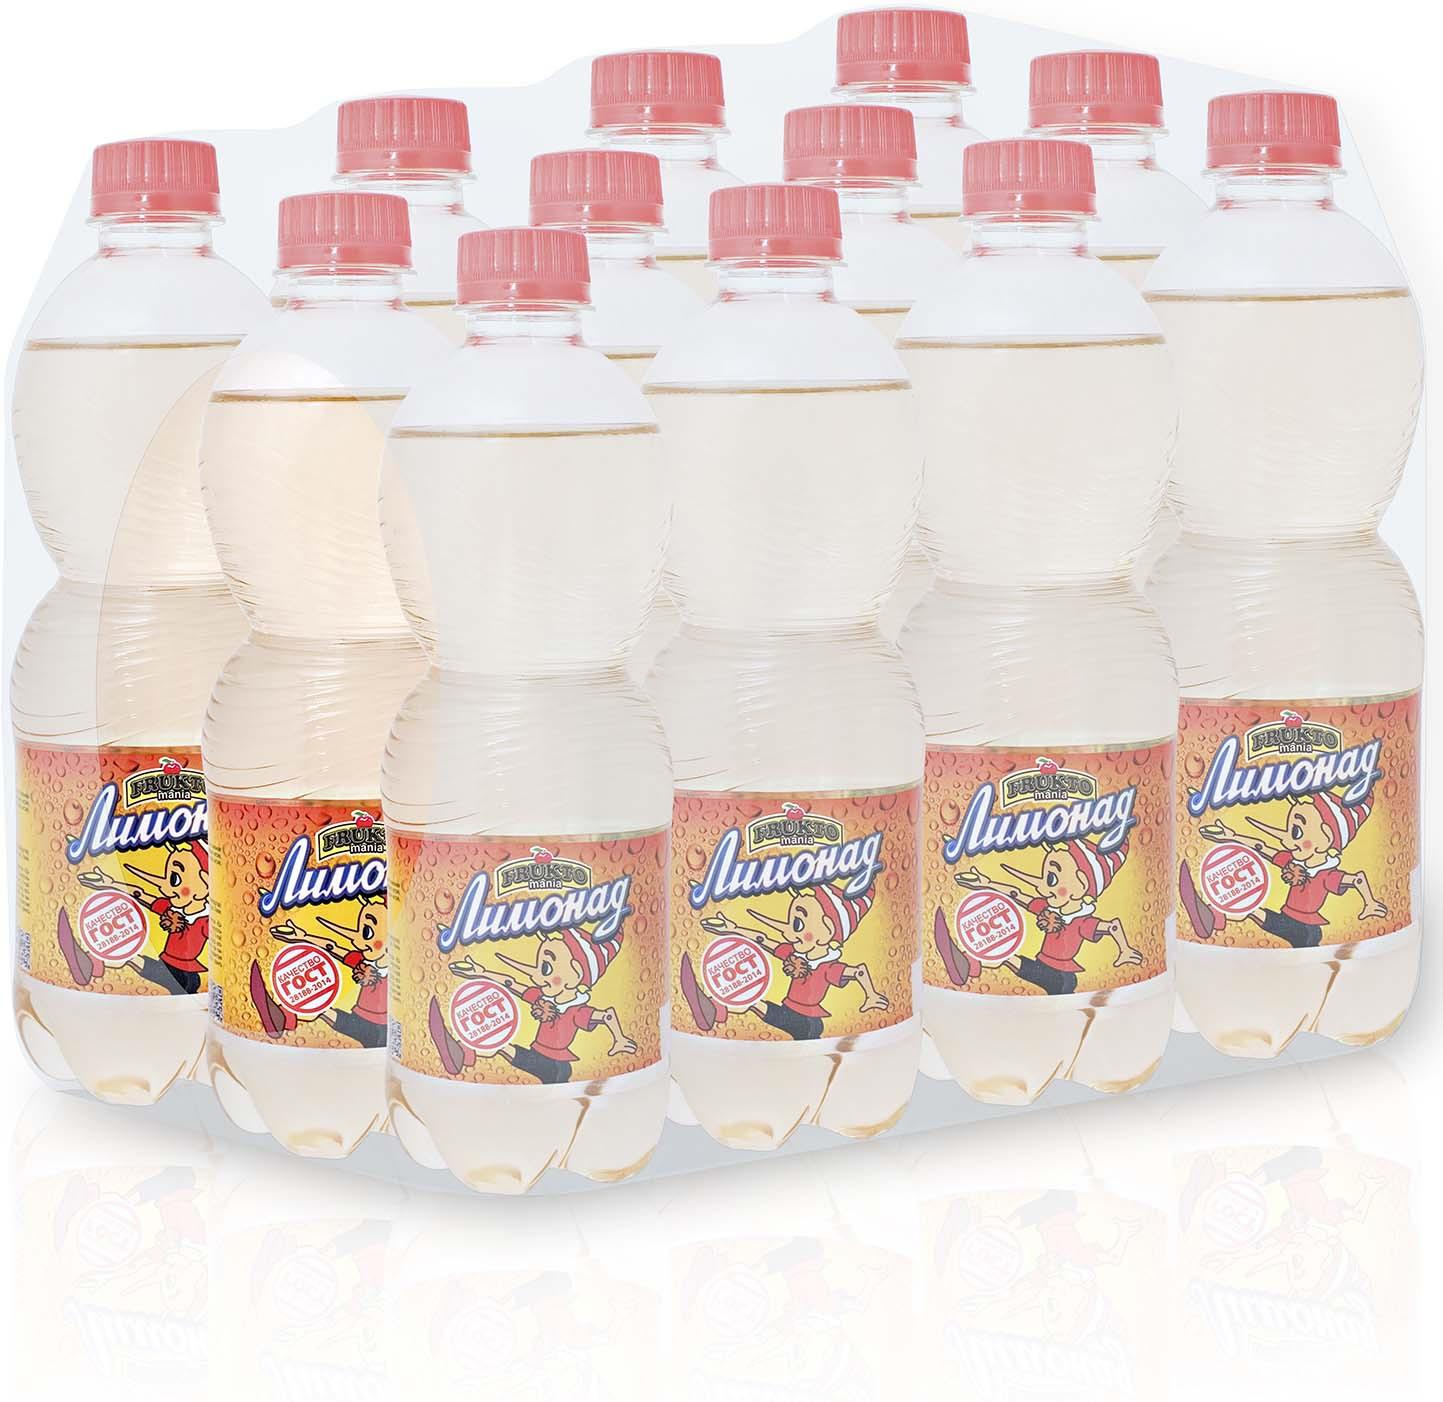 Лимонад Fruktomania, лимонад оригинальный, 12 шт по 0,5 л лимонад fruktomania лимонад оригинальный 6 шт по 1 5 л